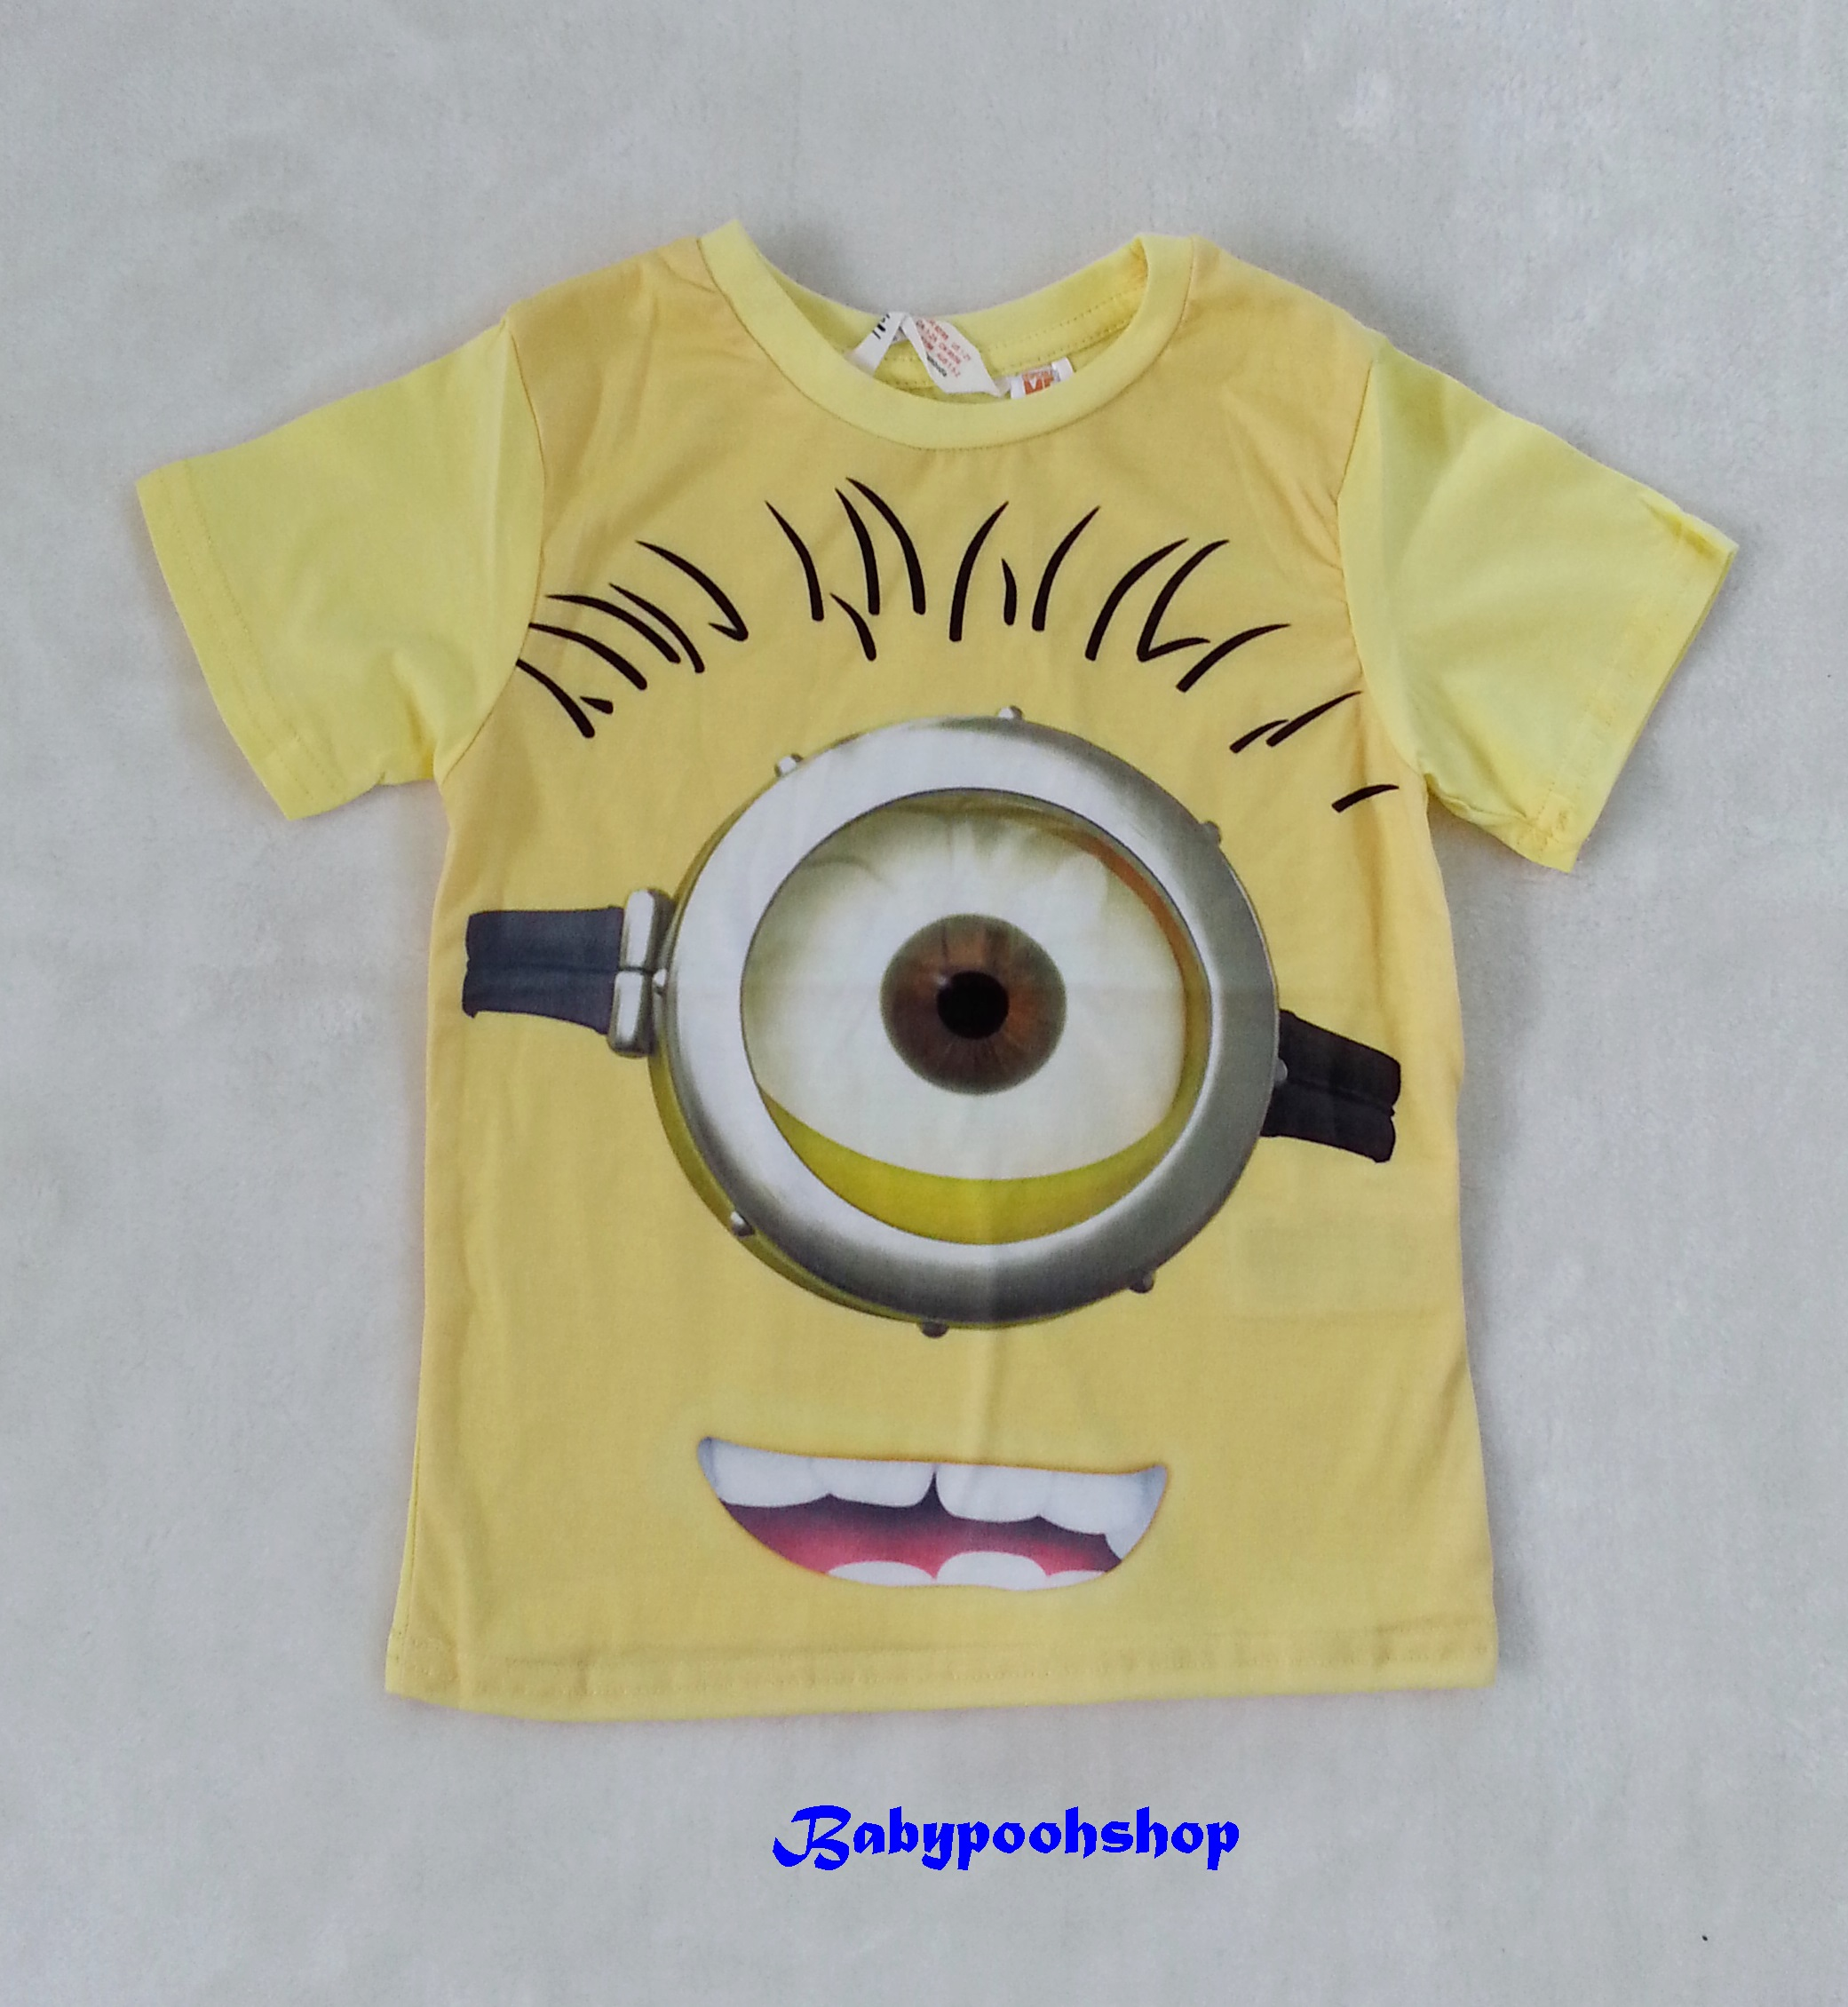 H&M : เสื้อยืด สีเหลือง สกรีนลายมินเนียน size : 1.5-2y /4-6y / 6-8y / 8-10y / 12-14y